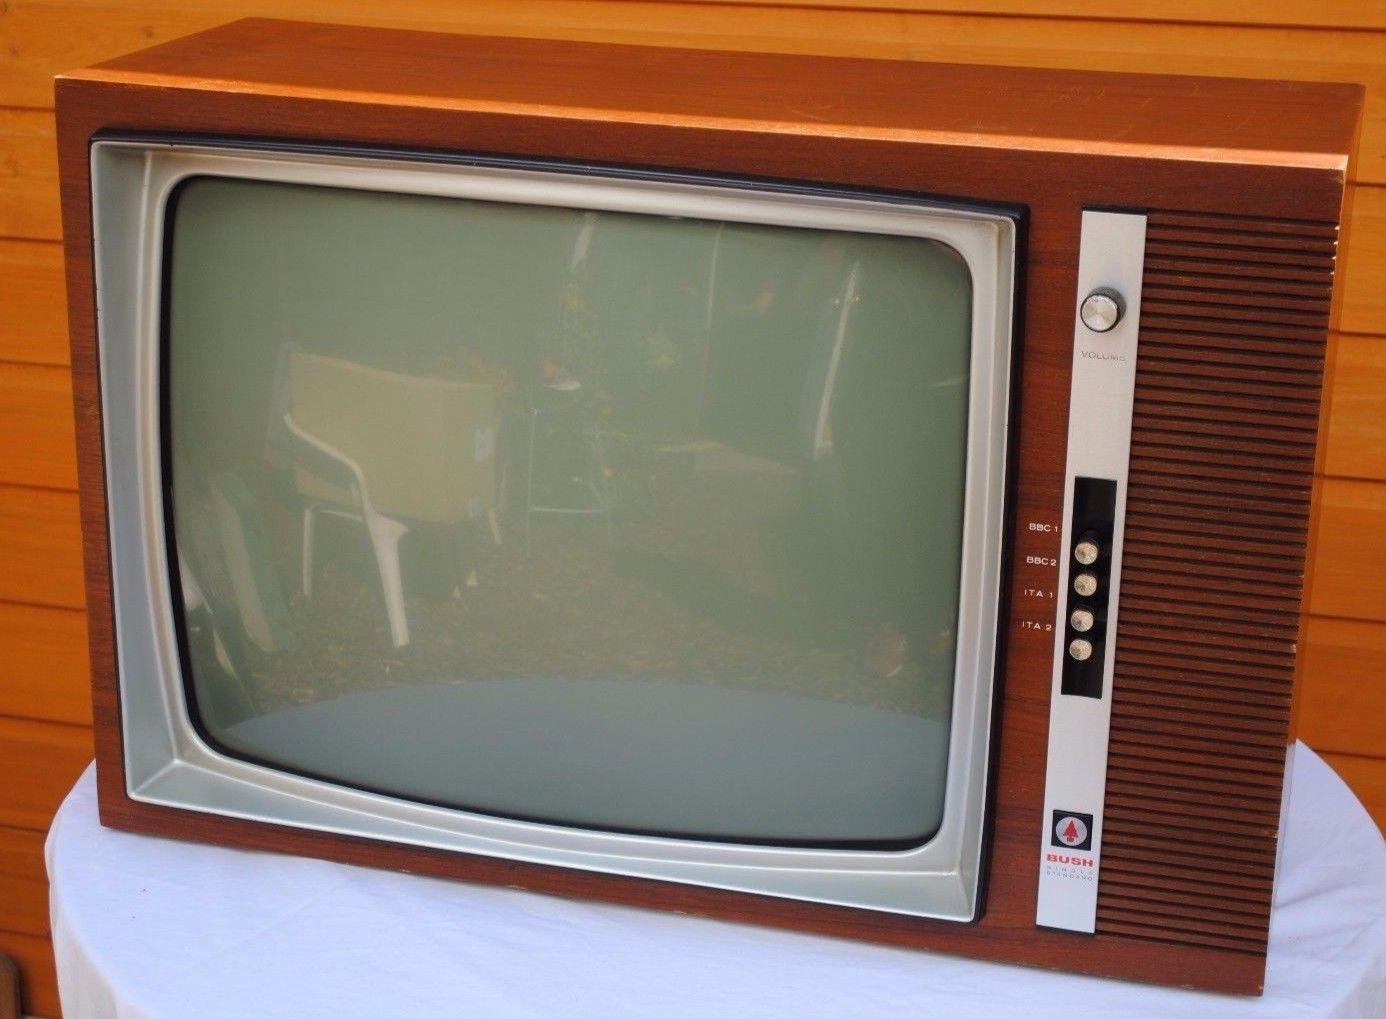 Vintage 1970s Bush Tv186ss 24 625 Line Black And White Valve